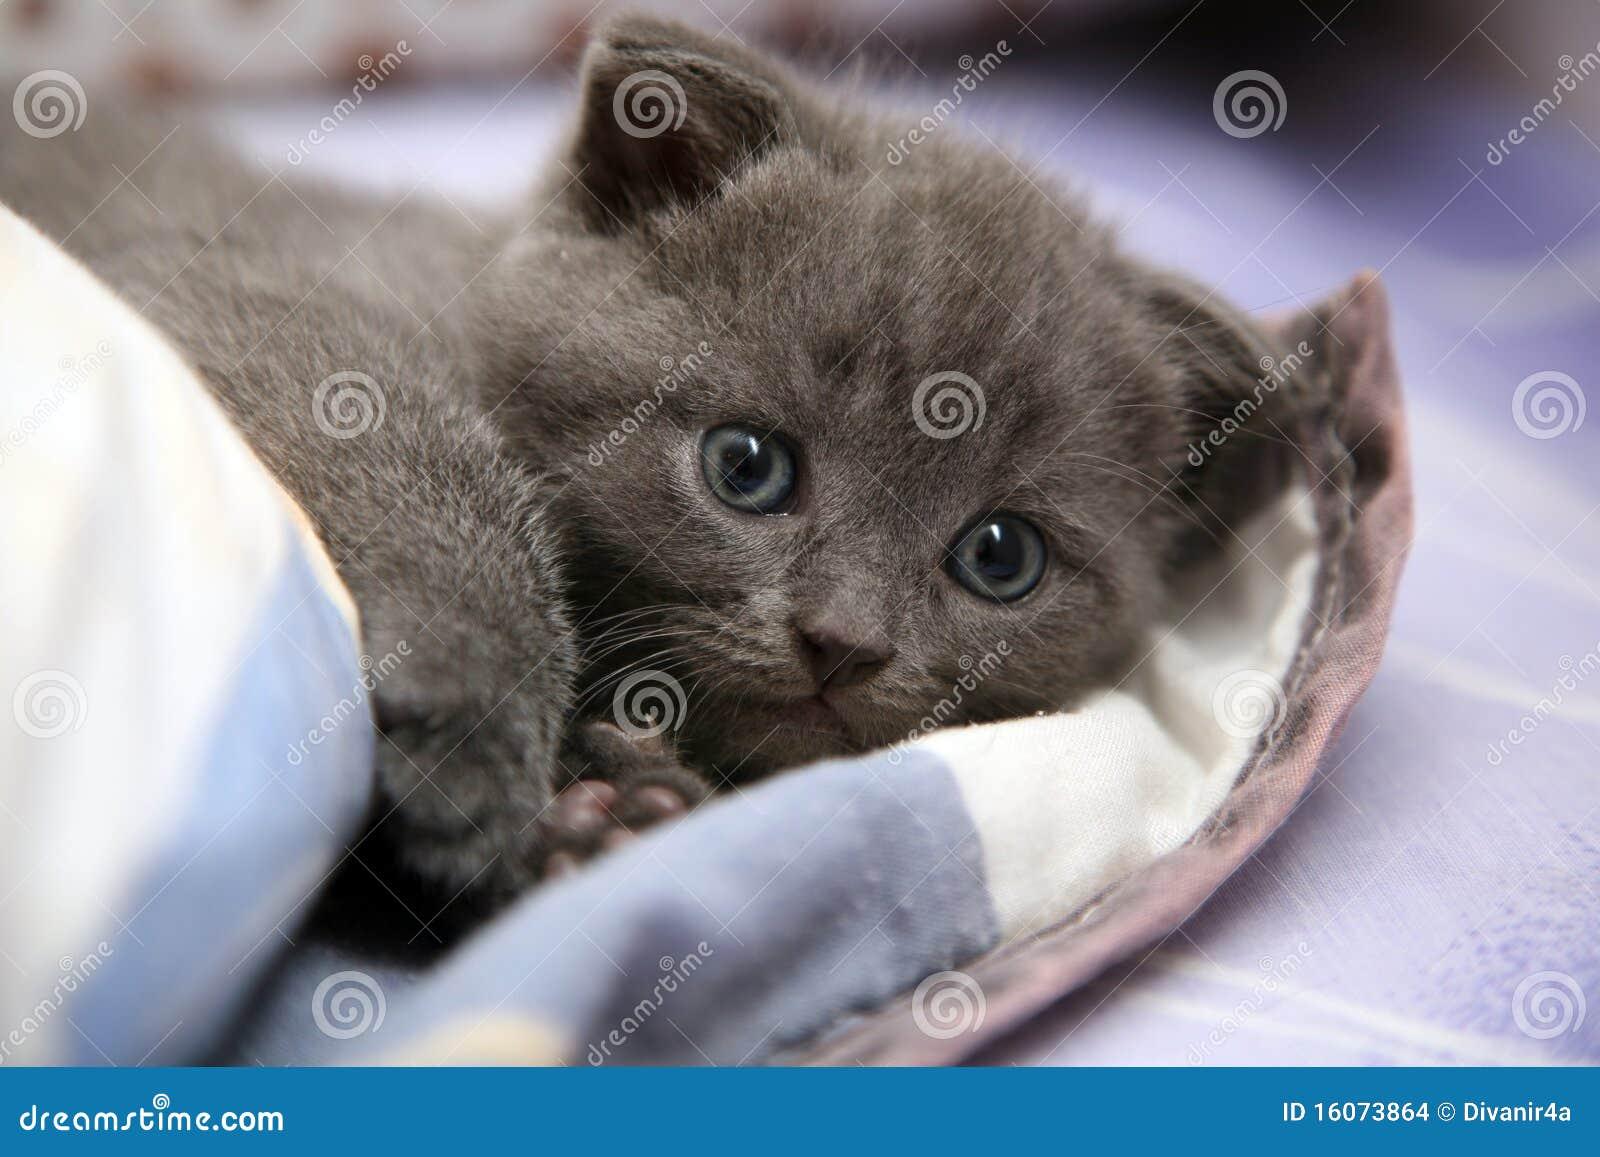 Cute Little Kitten Stock Images Image 16073864